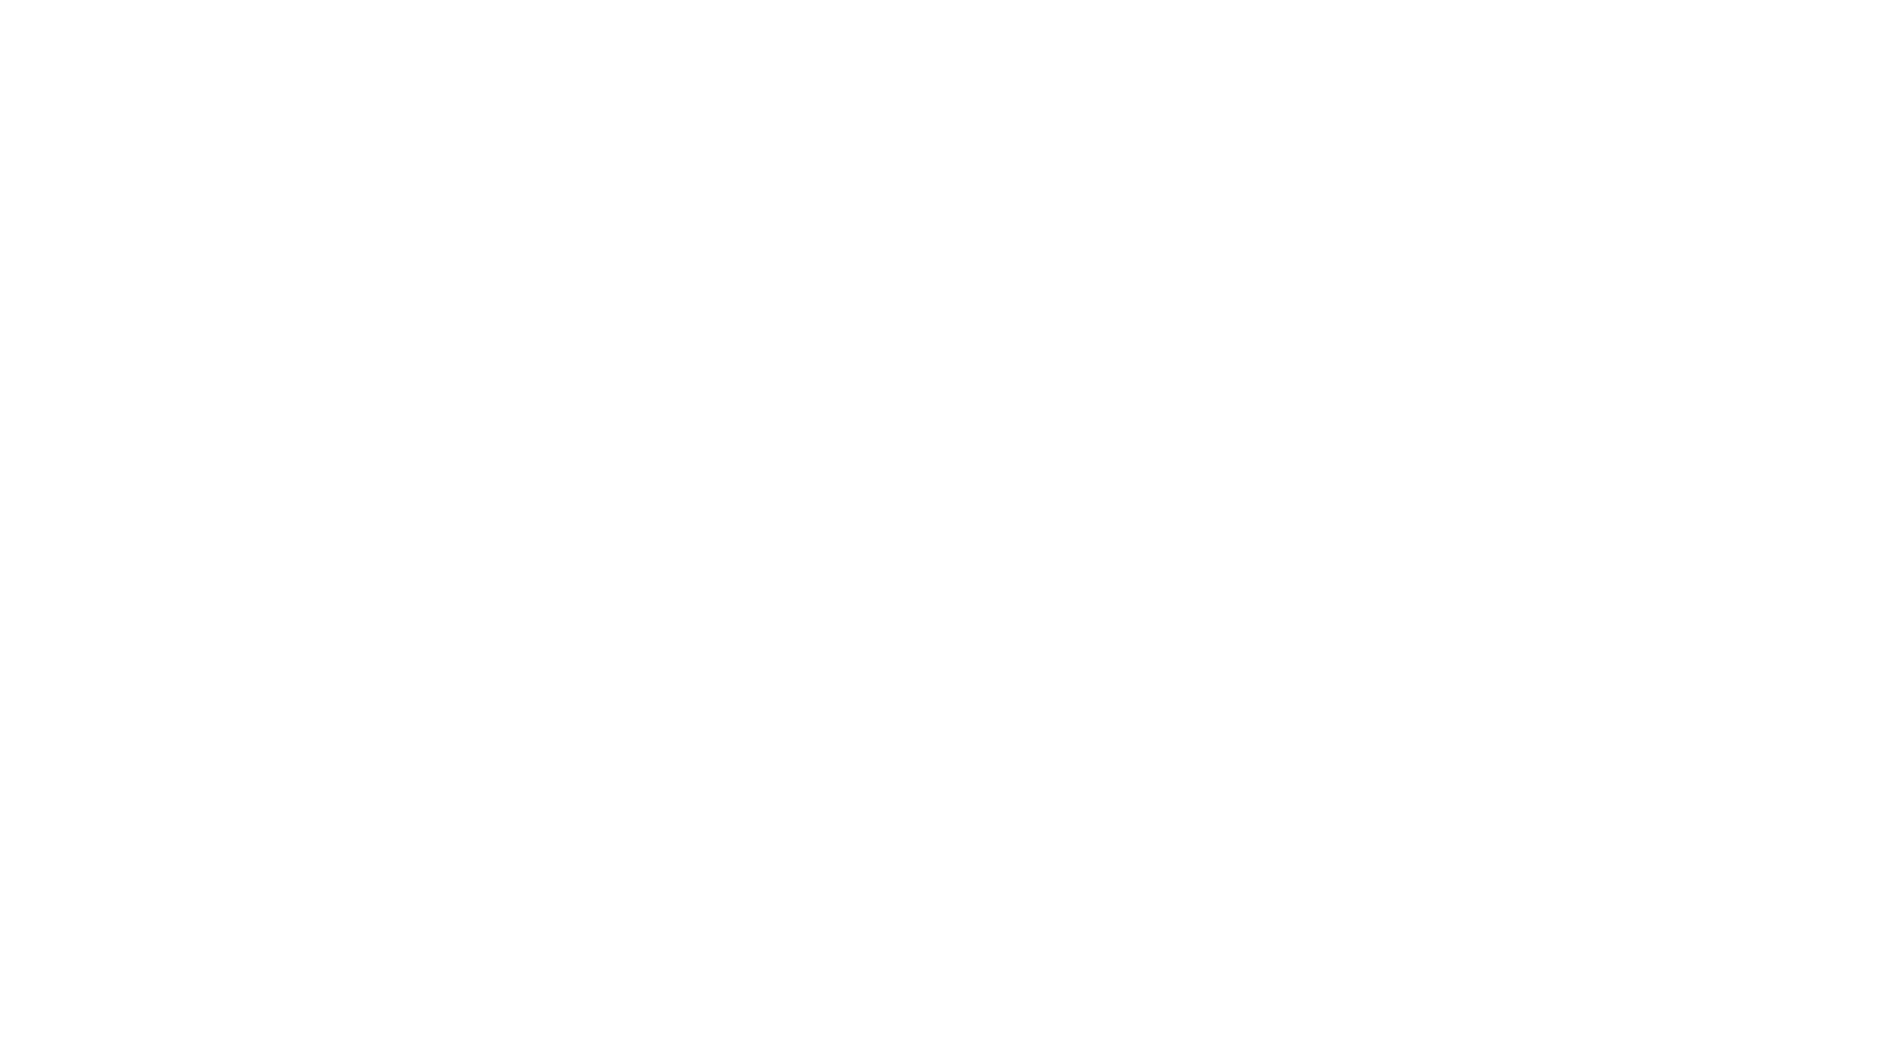 Logo-doc-07.png